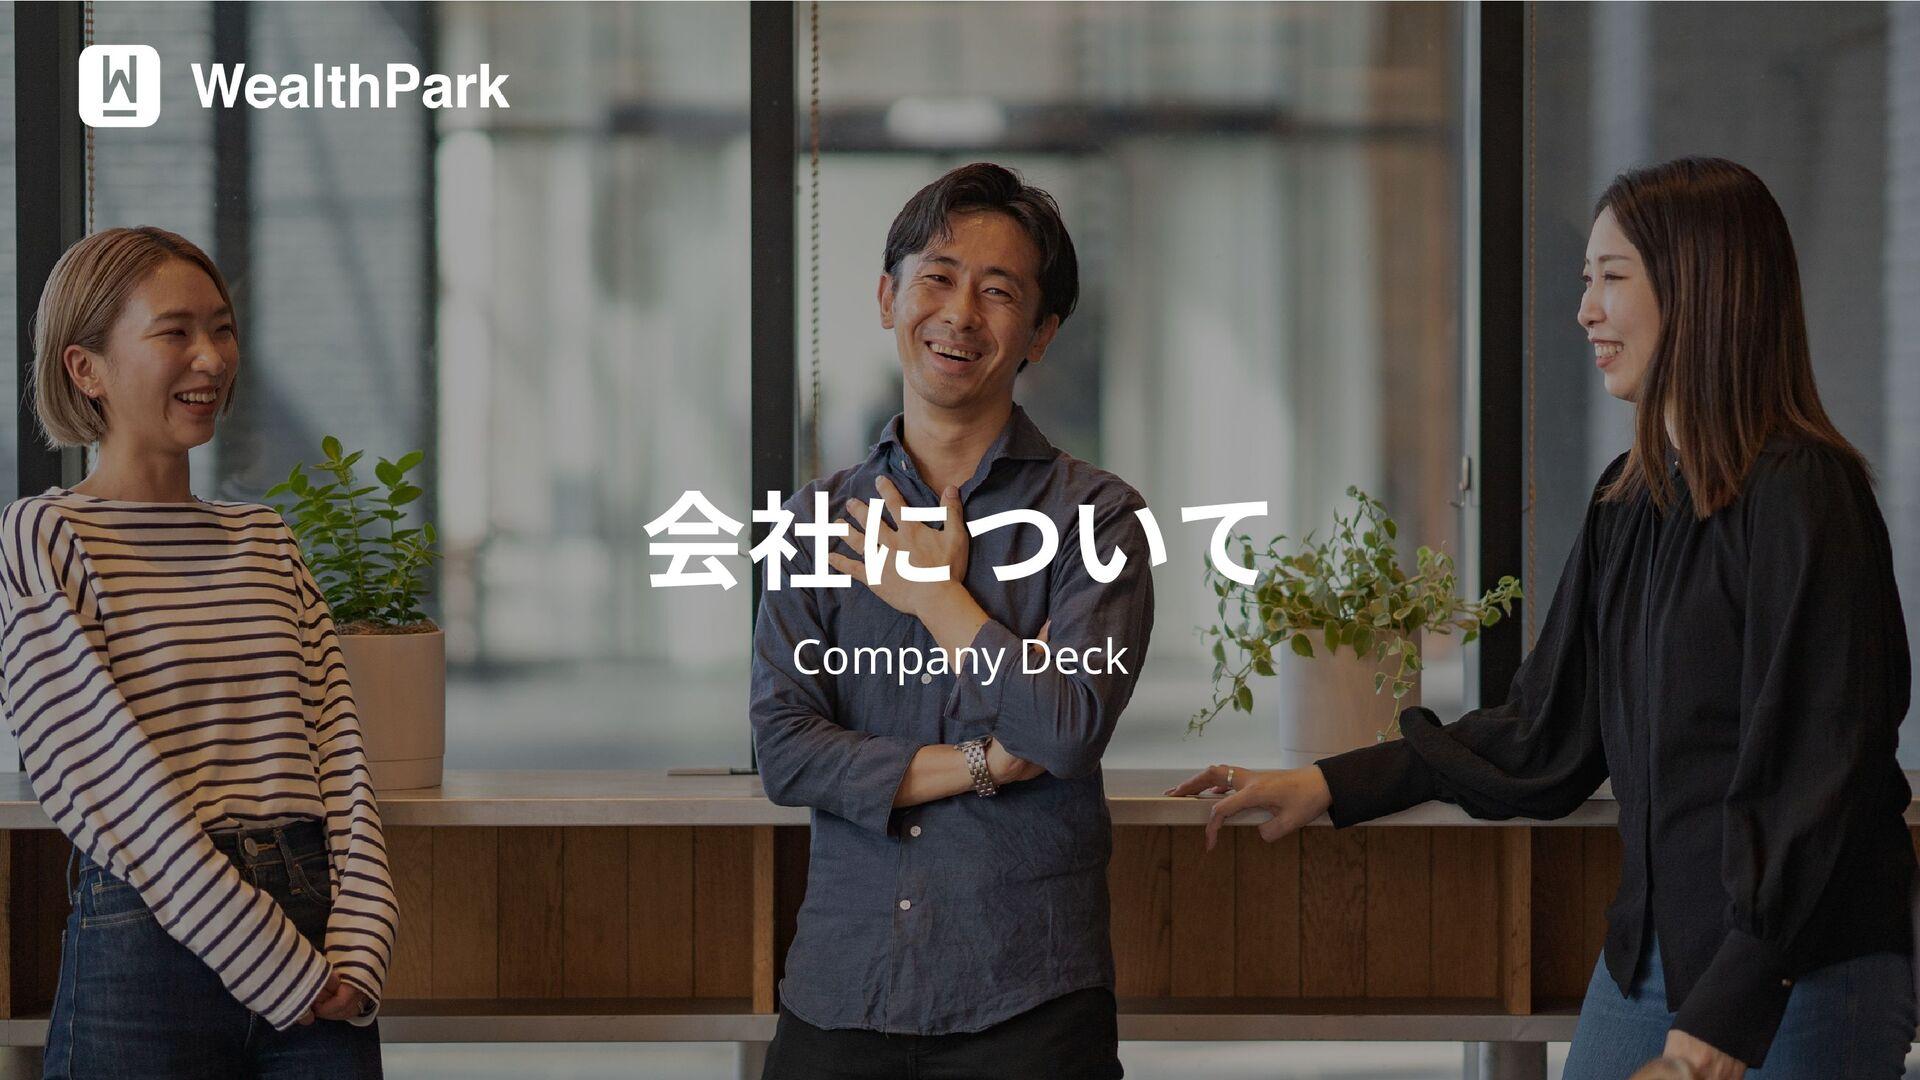 ձ ࣾ  հ  ྉ Company Profile